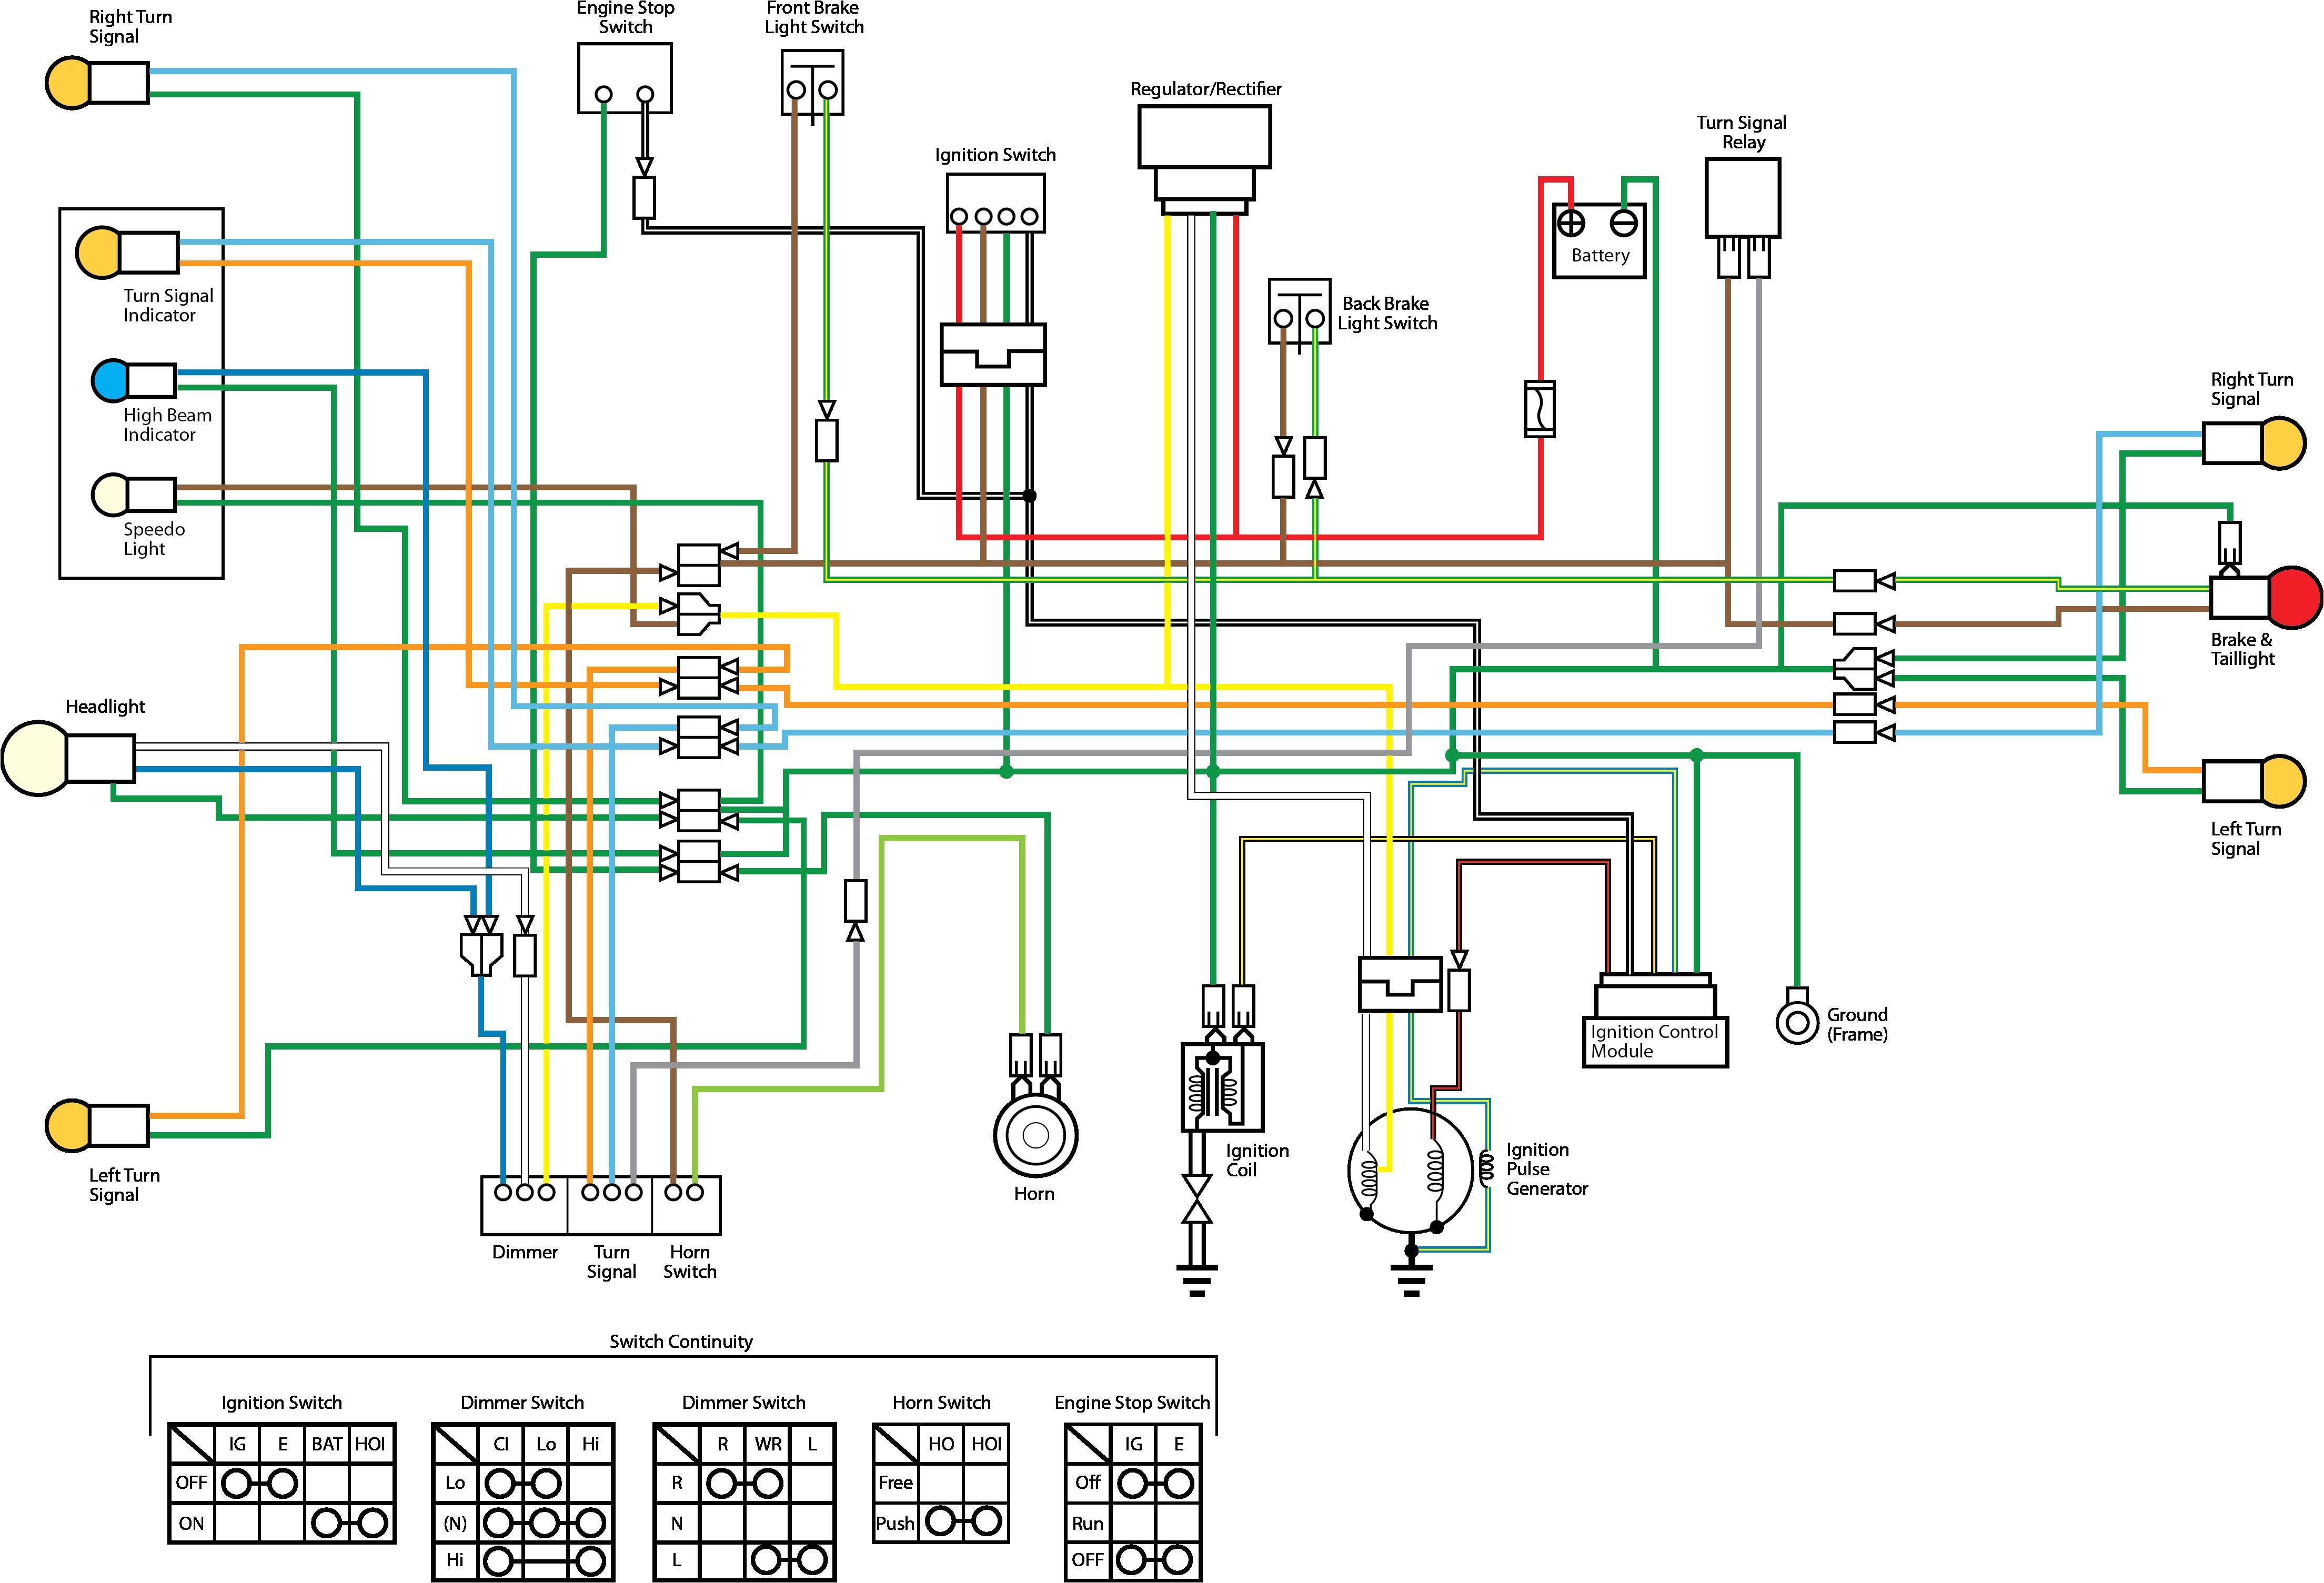 honda wave 100 electrical wiring diagram pdf unique wiring diagram moreover honda 125 wiring diagram as well as honda of honda wave 100 electrical wiring diagram pdf jpg